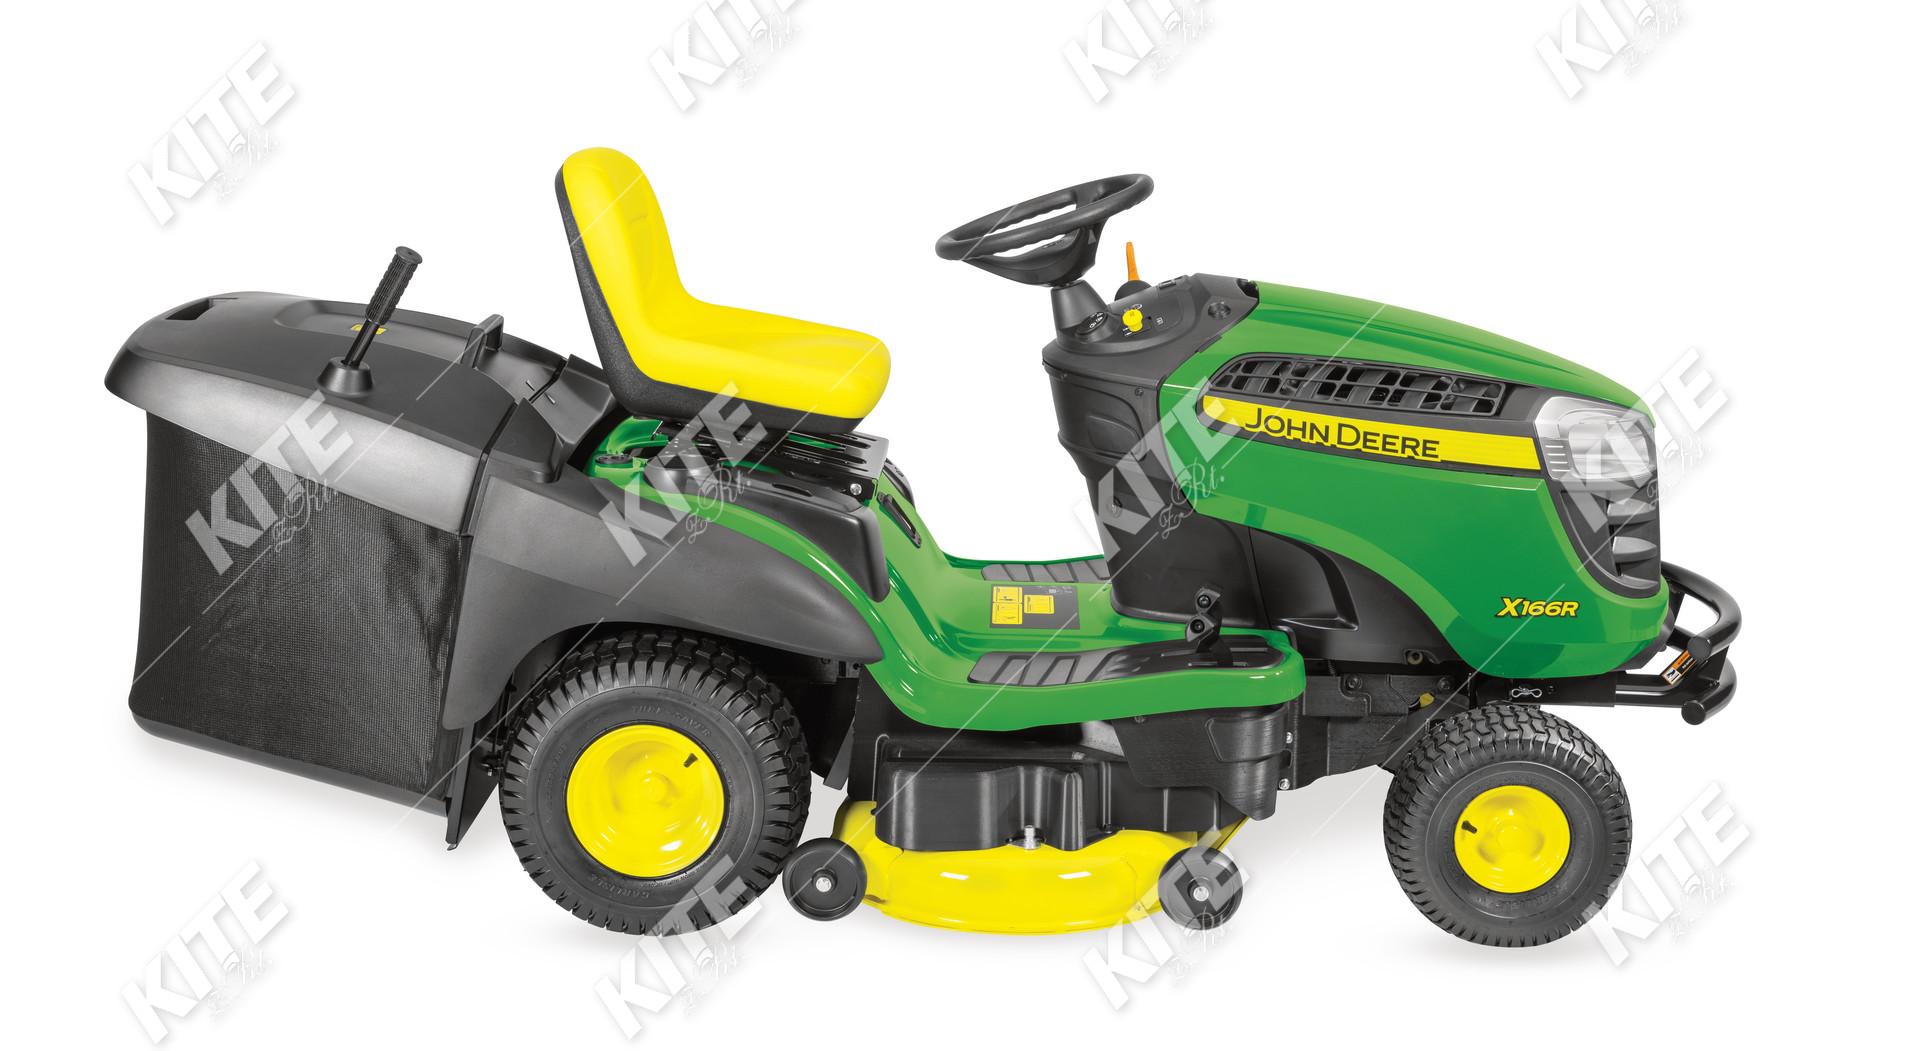 John Deere X166R fűnyírótraktor